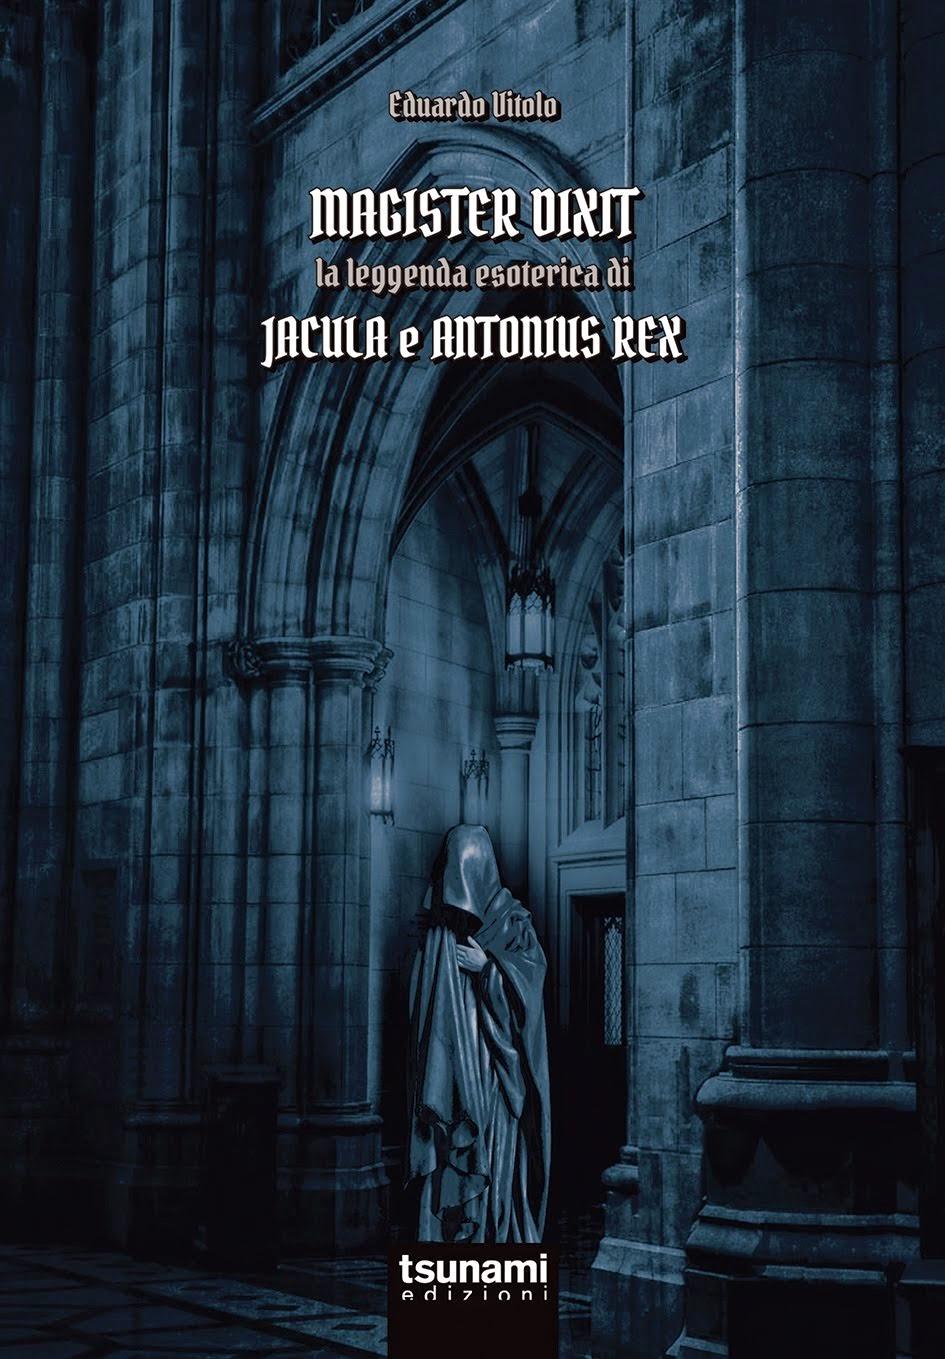 MAGISTER DIXIT. LA LEGGENDA ESOTERICA DI JACULA E ANTONIUS REX